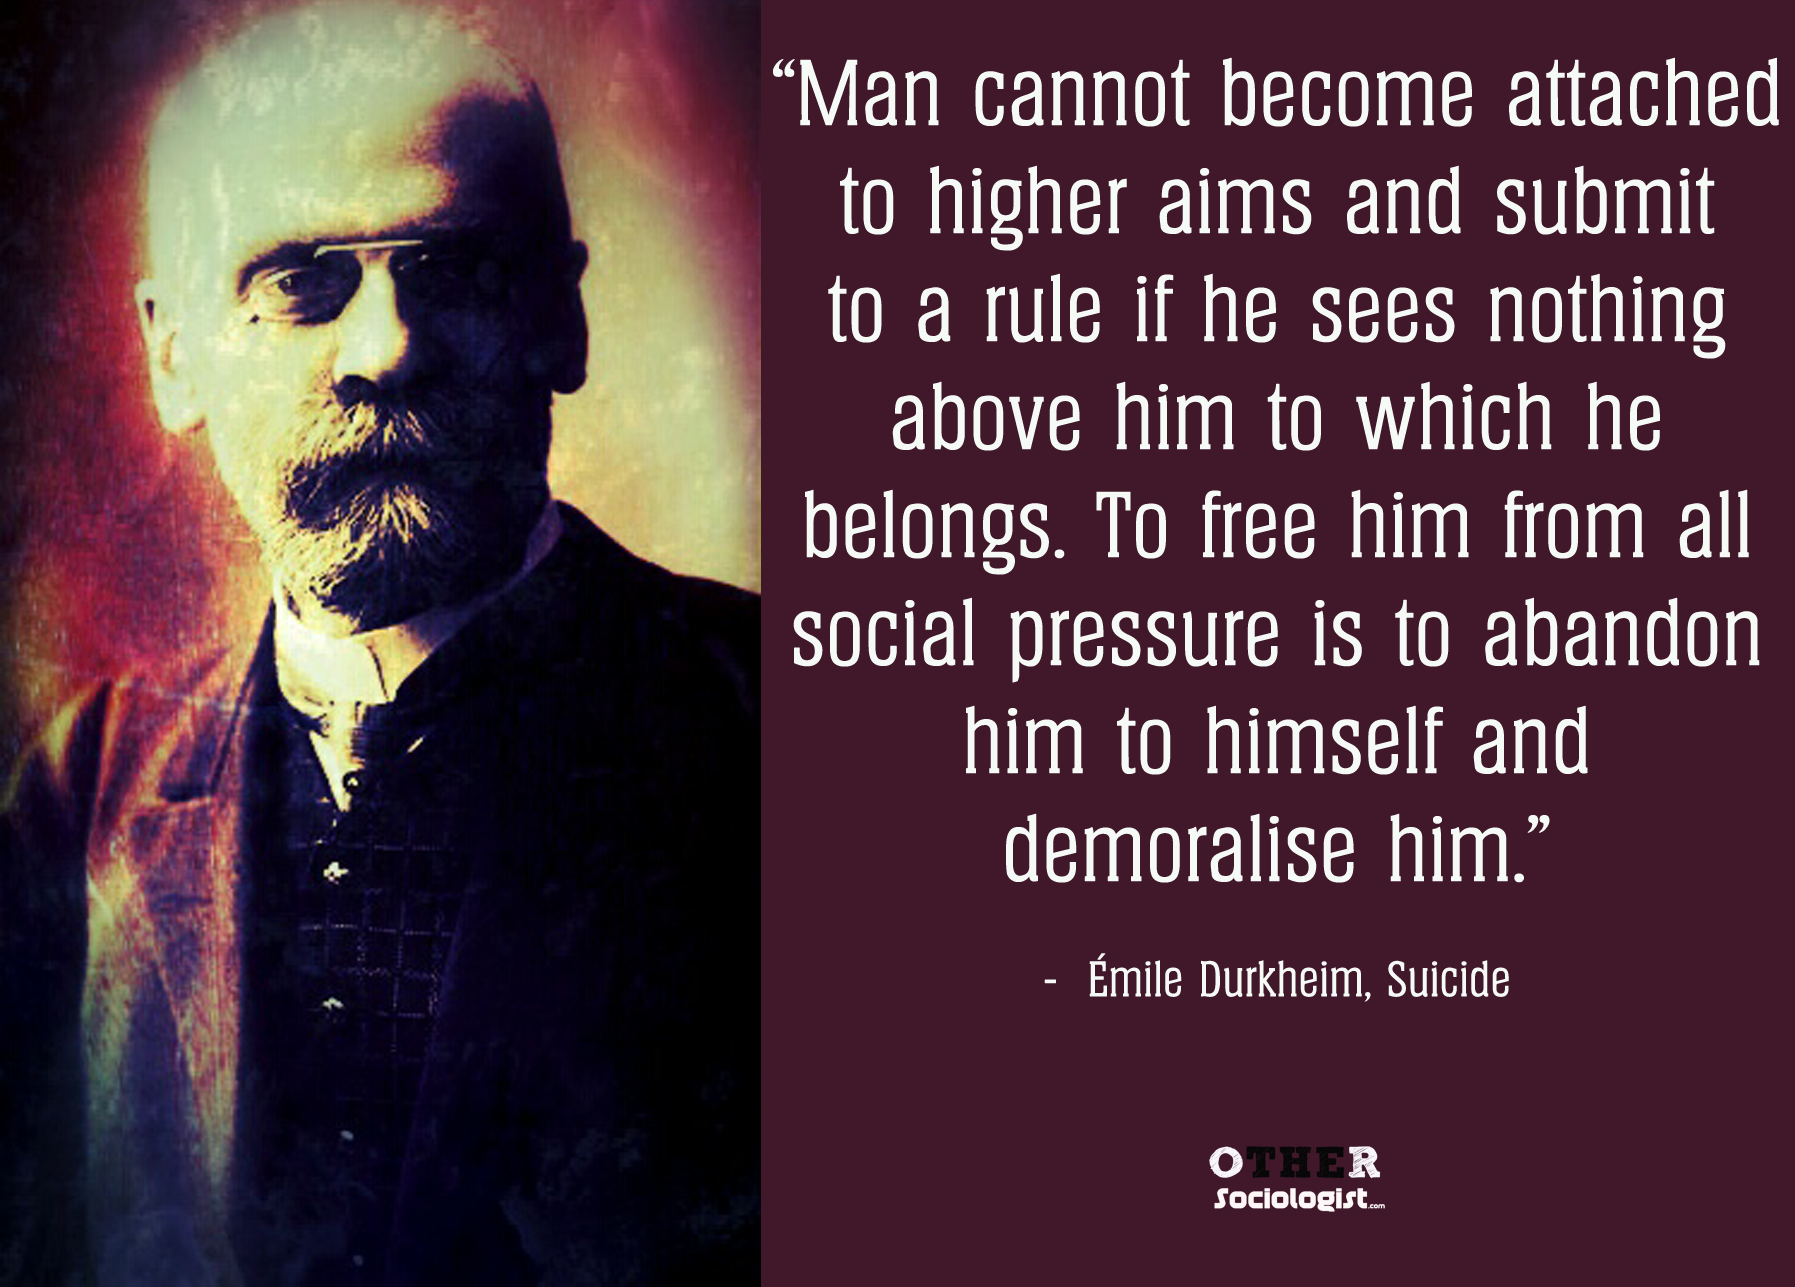 emile durkheim thesis on suicide